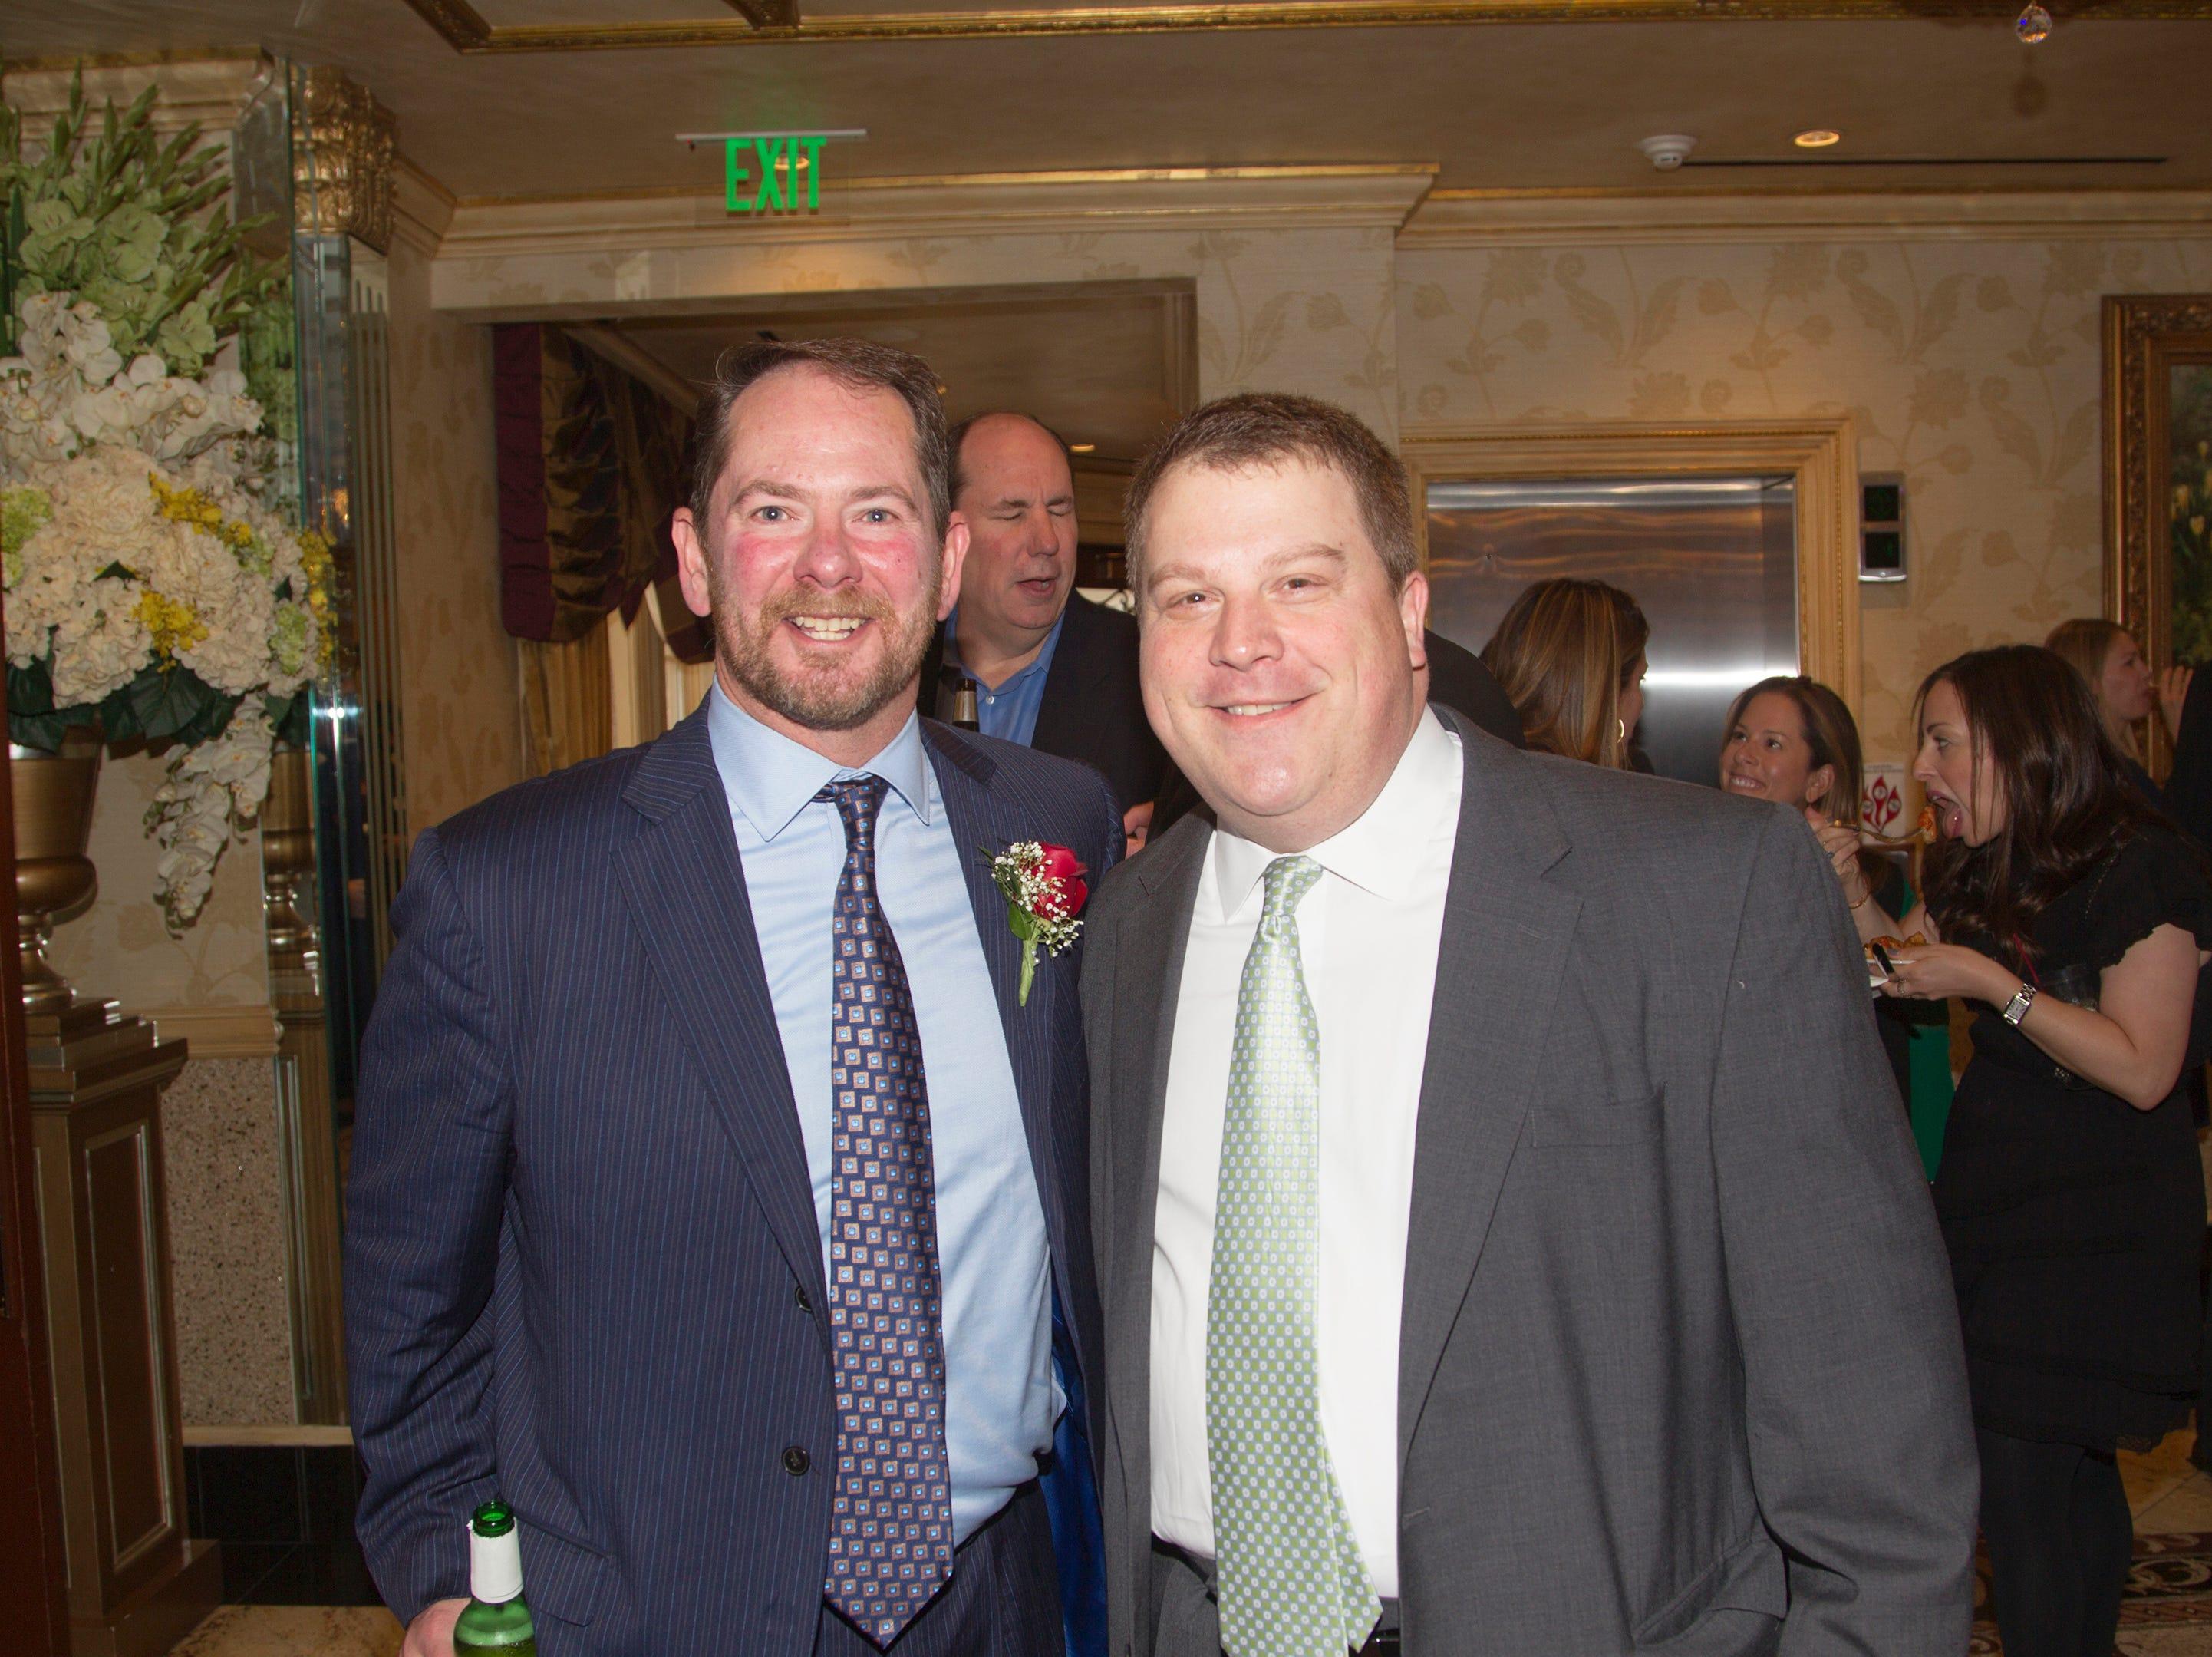 Honoree Rich Tandy, Bob Seco. Bergen Catholic High School Hall of Fame Dinner at Seasons in Washington Twp. 03/31/2019